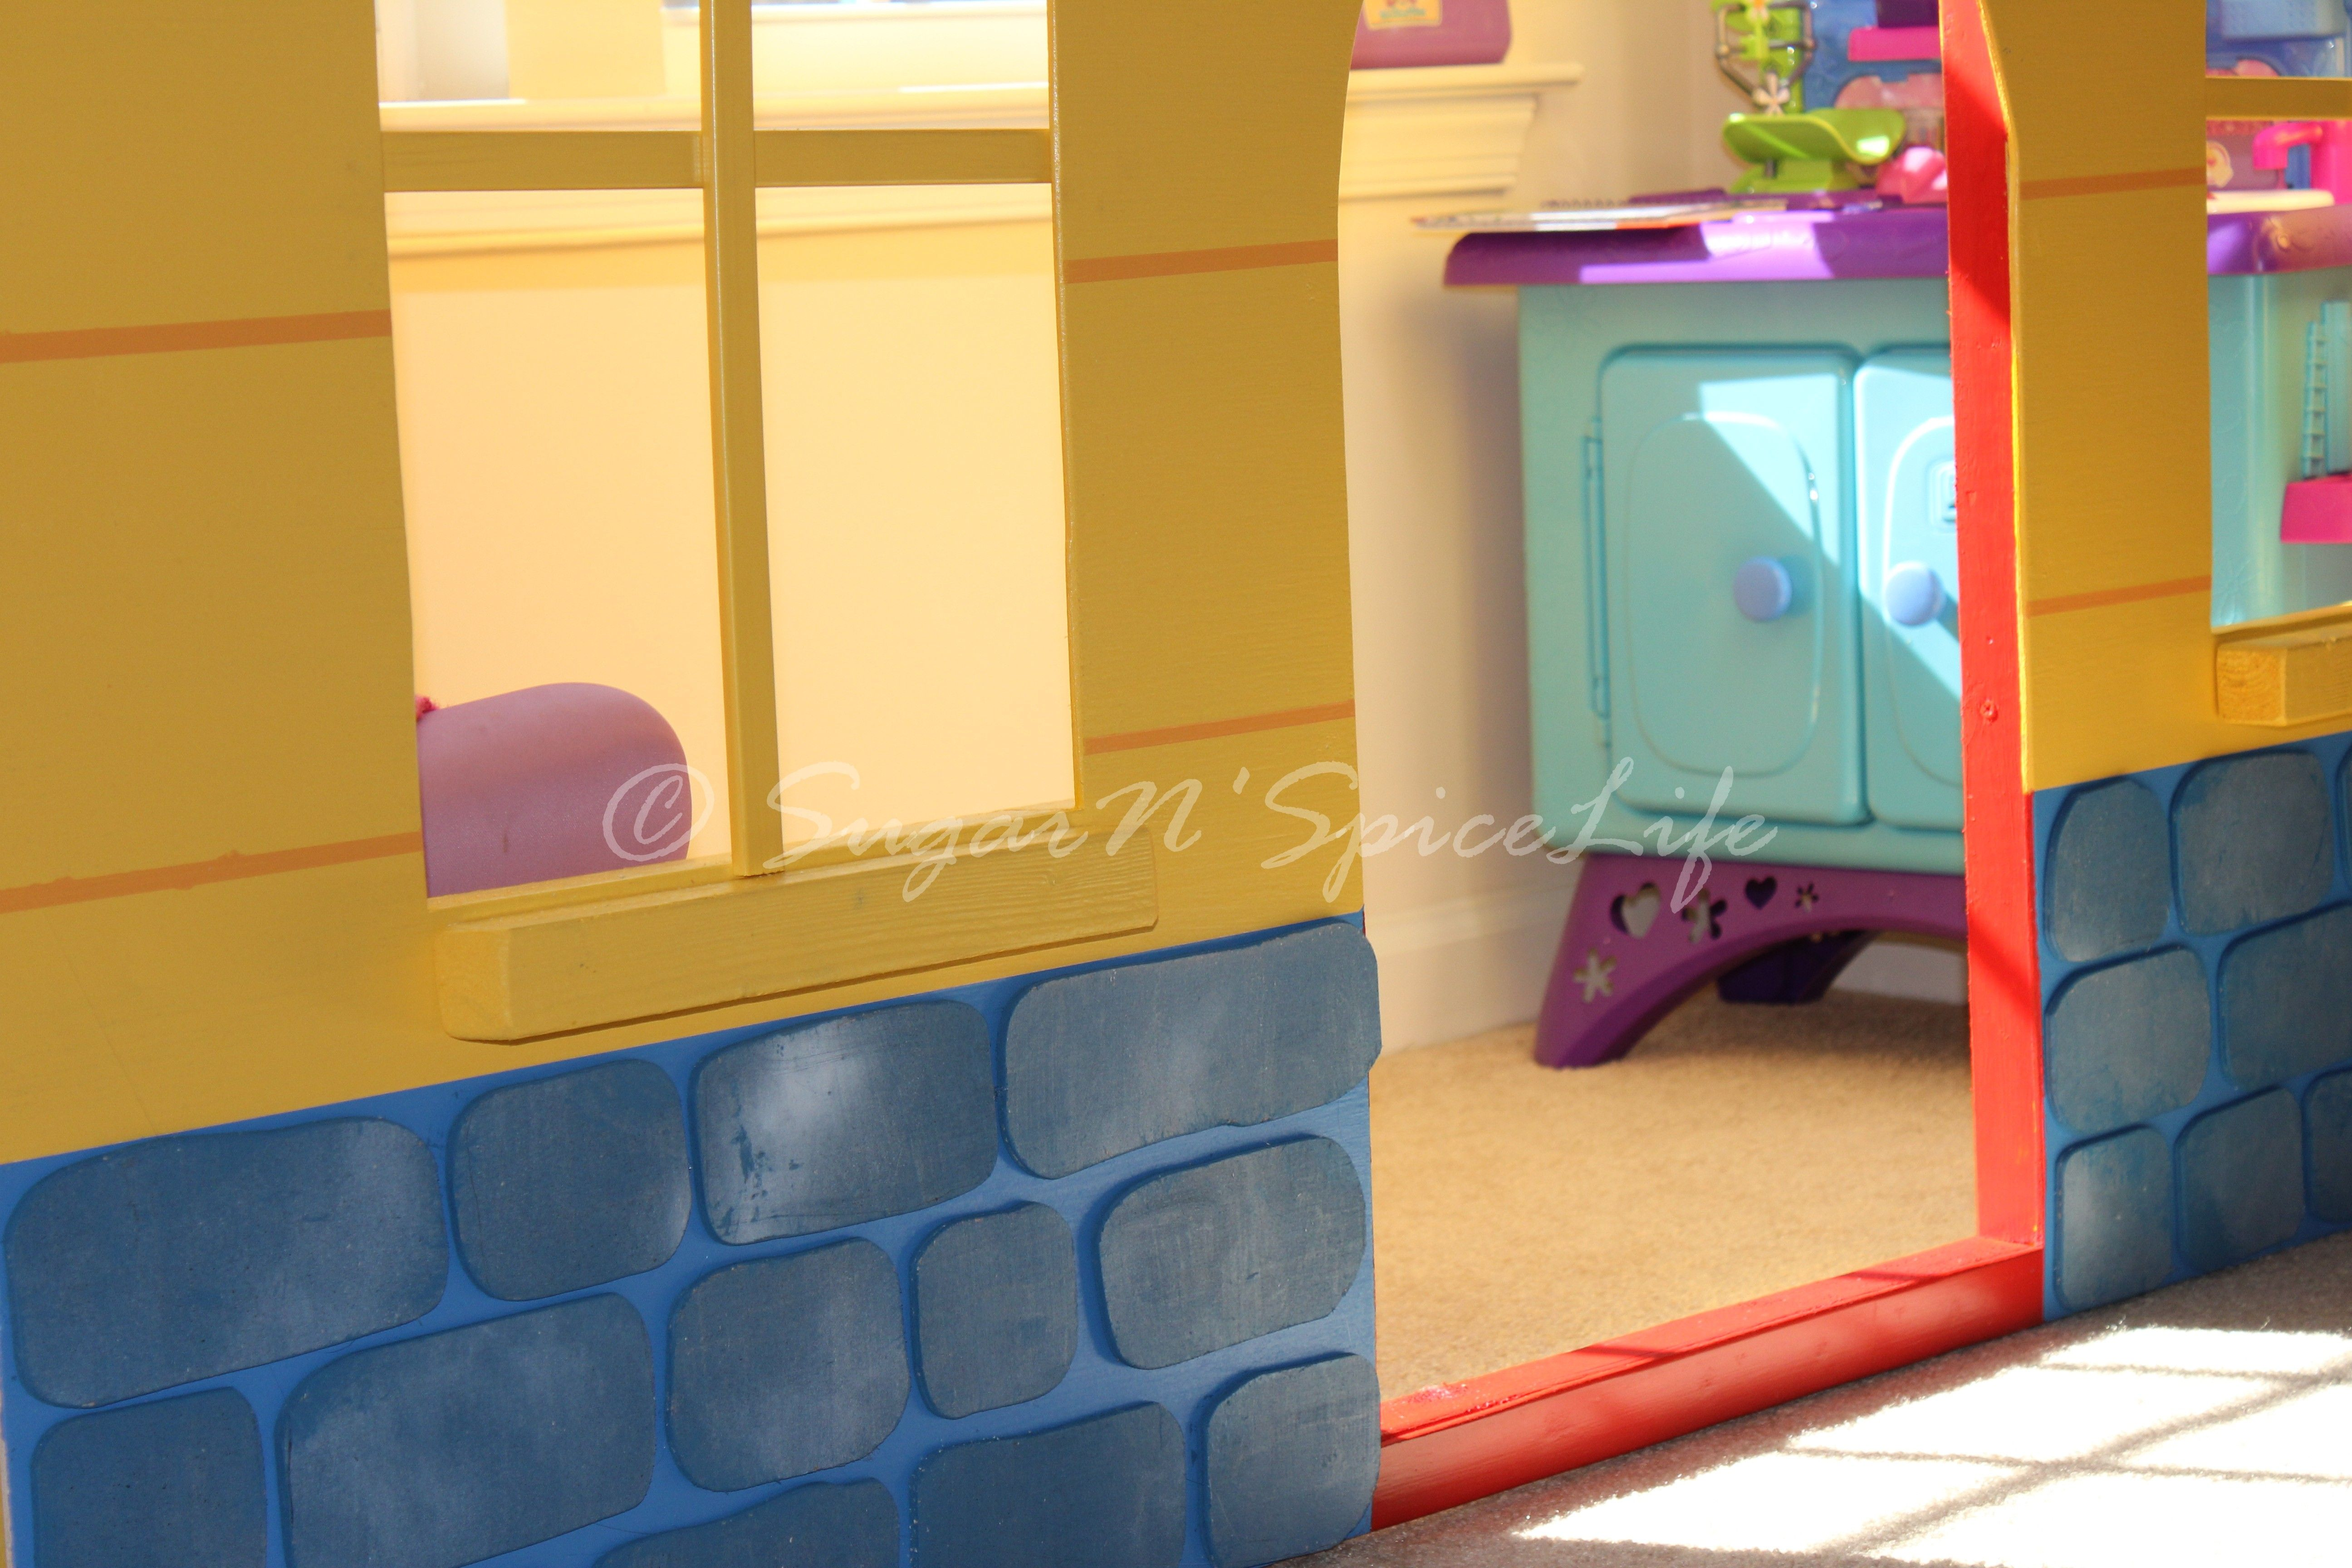 Careena S Doc Mcstuffins 3rd Birthday Party Kids Indoor Play Diy Doctor Kids Playground